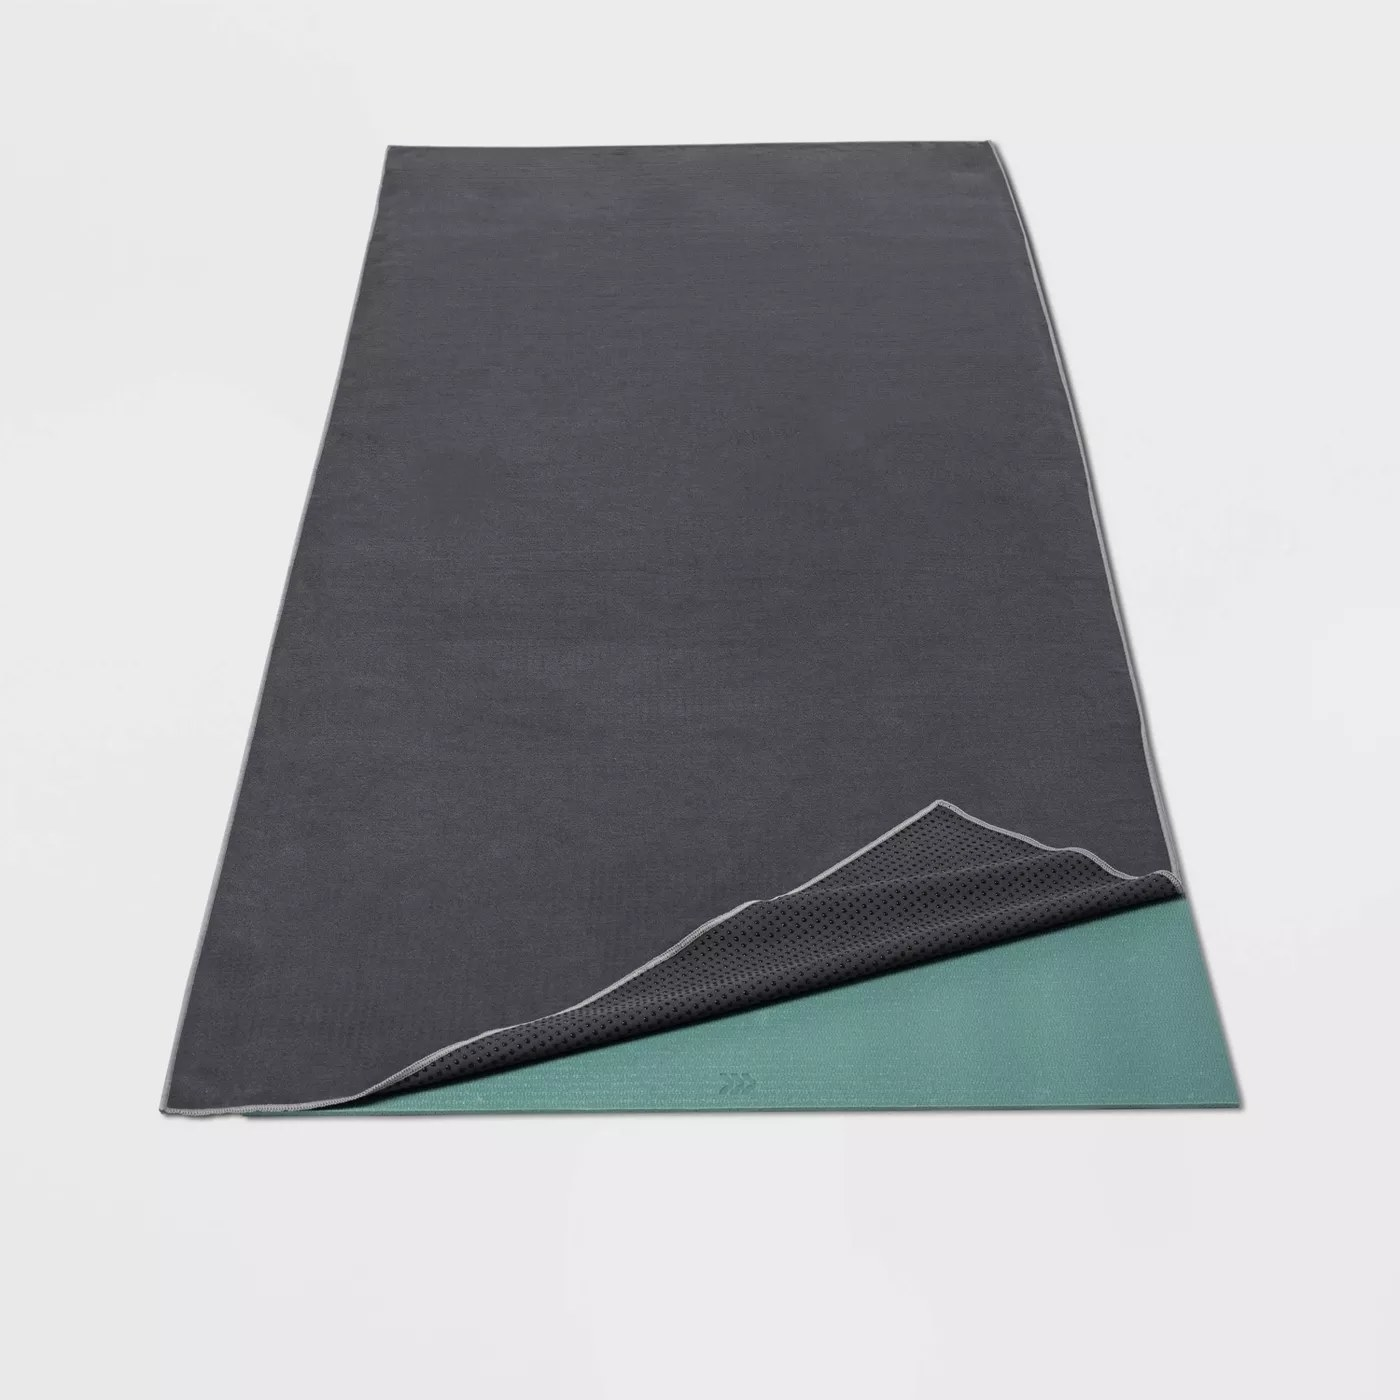 The gray yoga mat towe